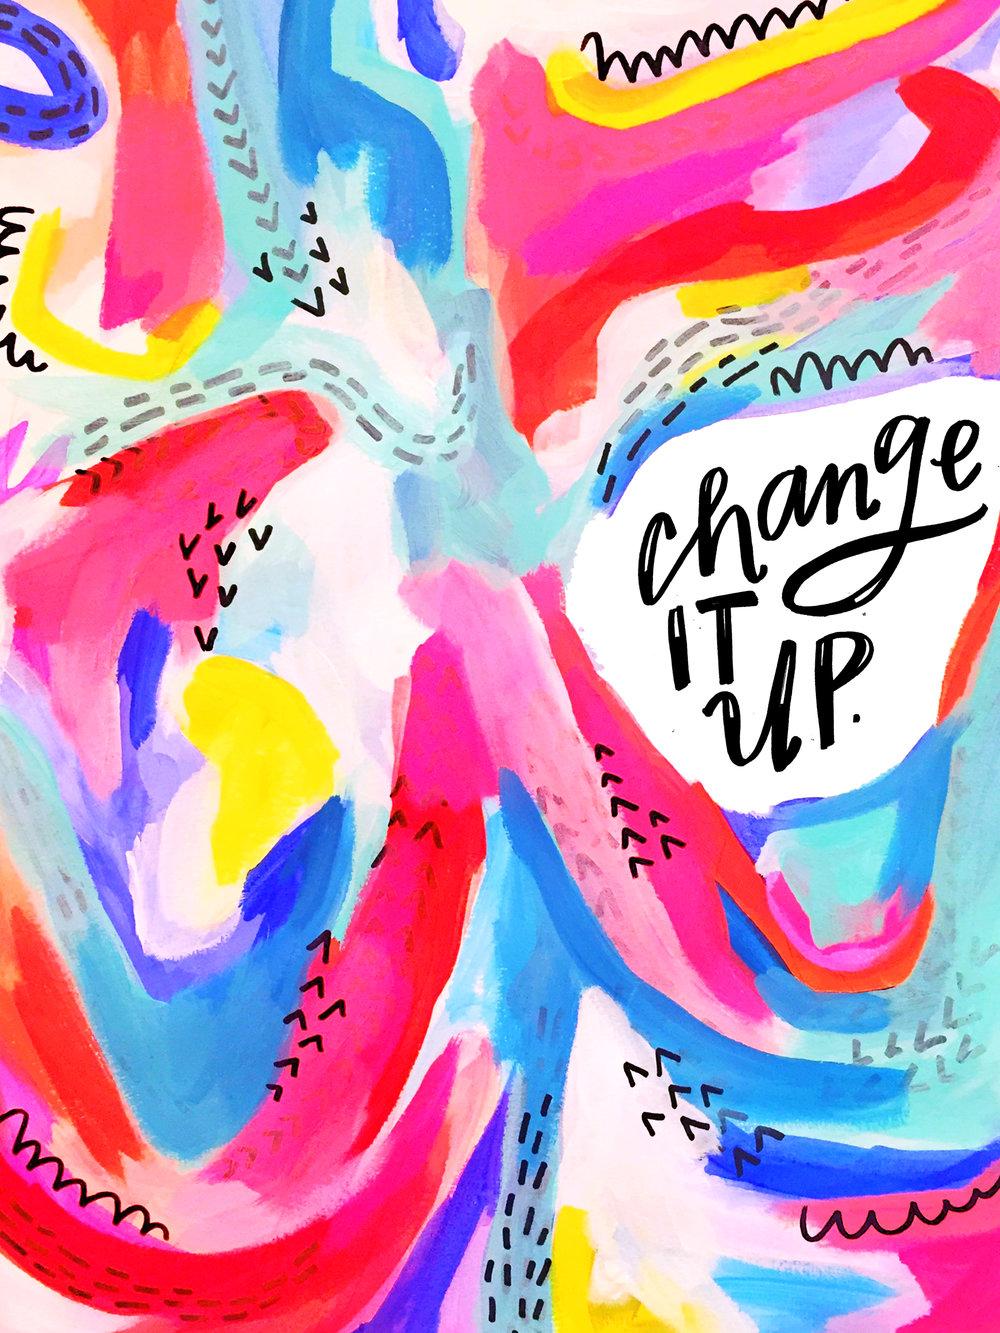 1/26/16: Change